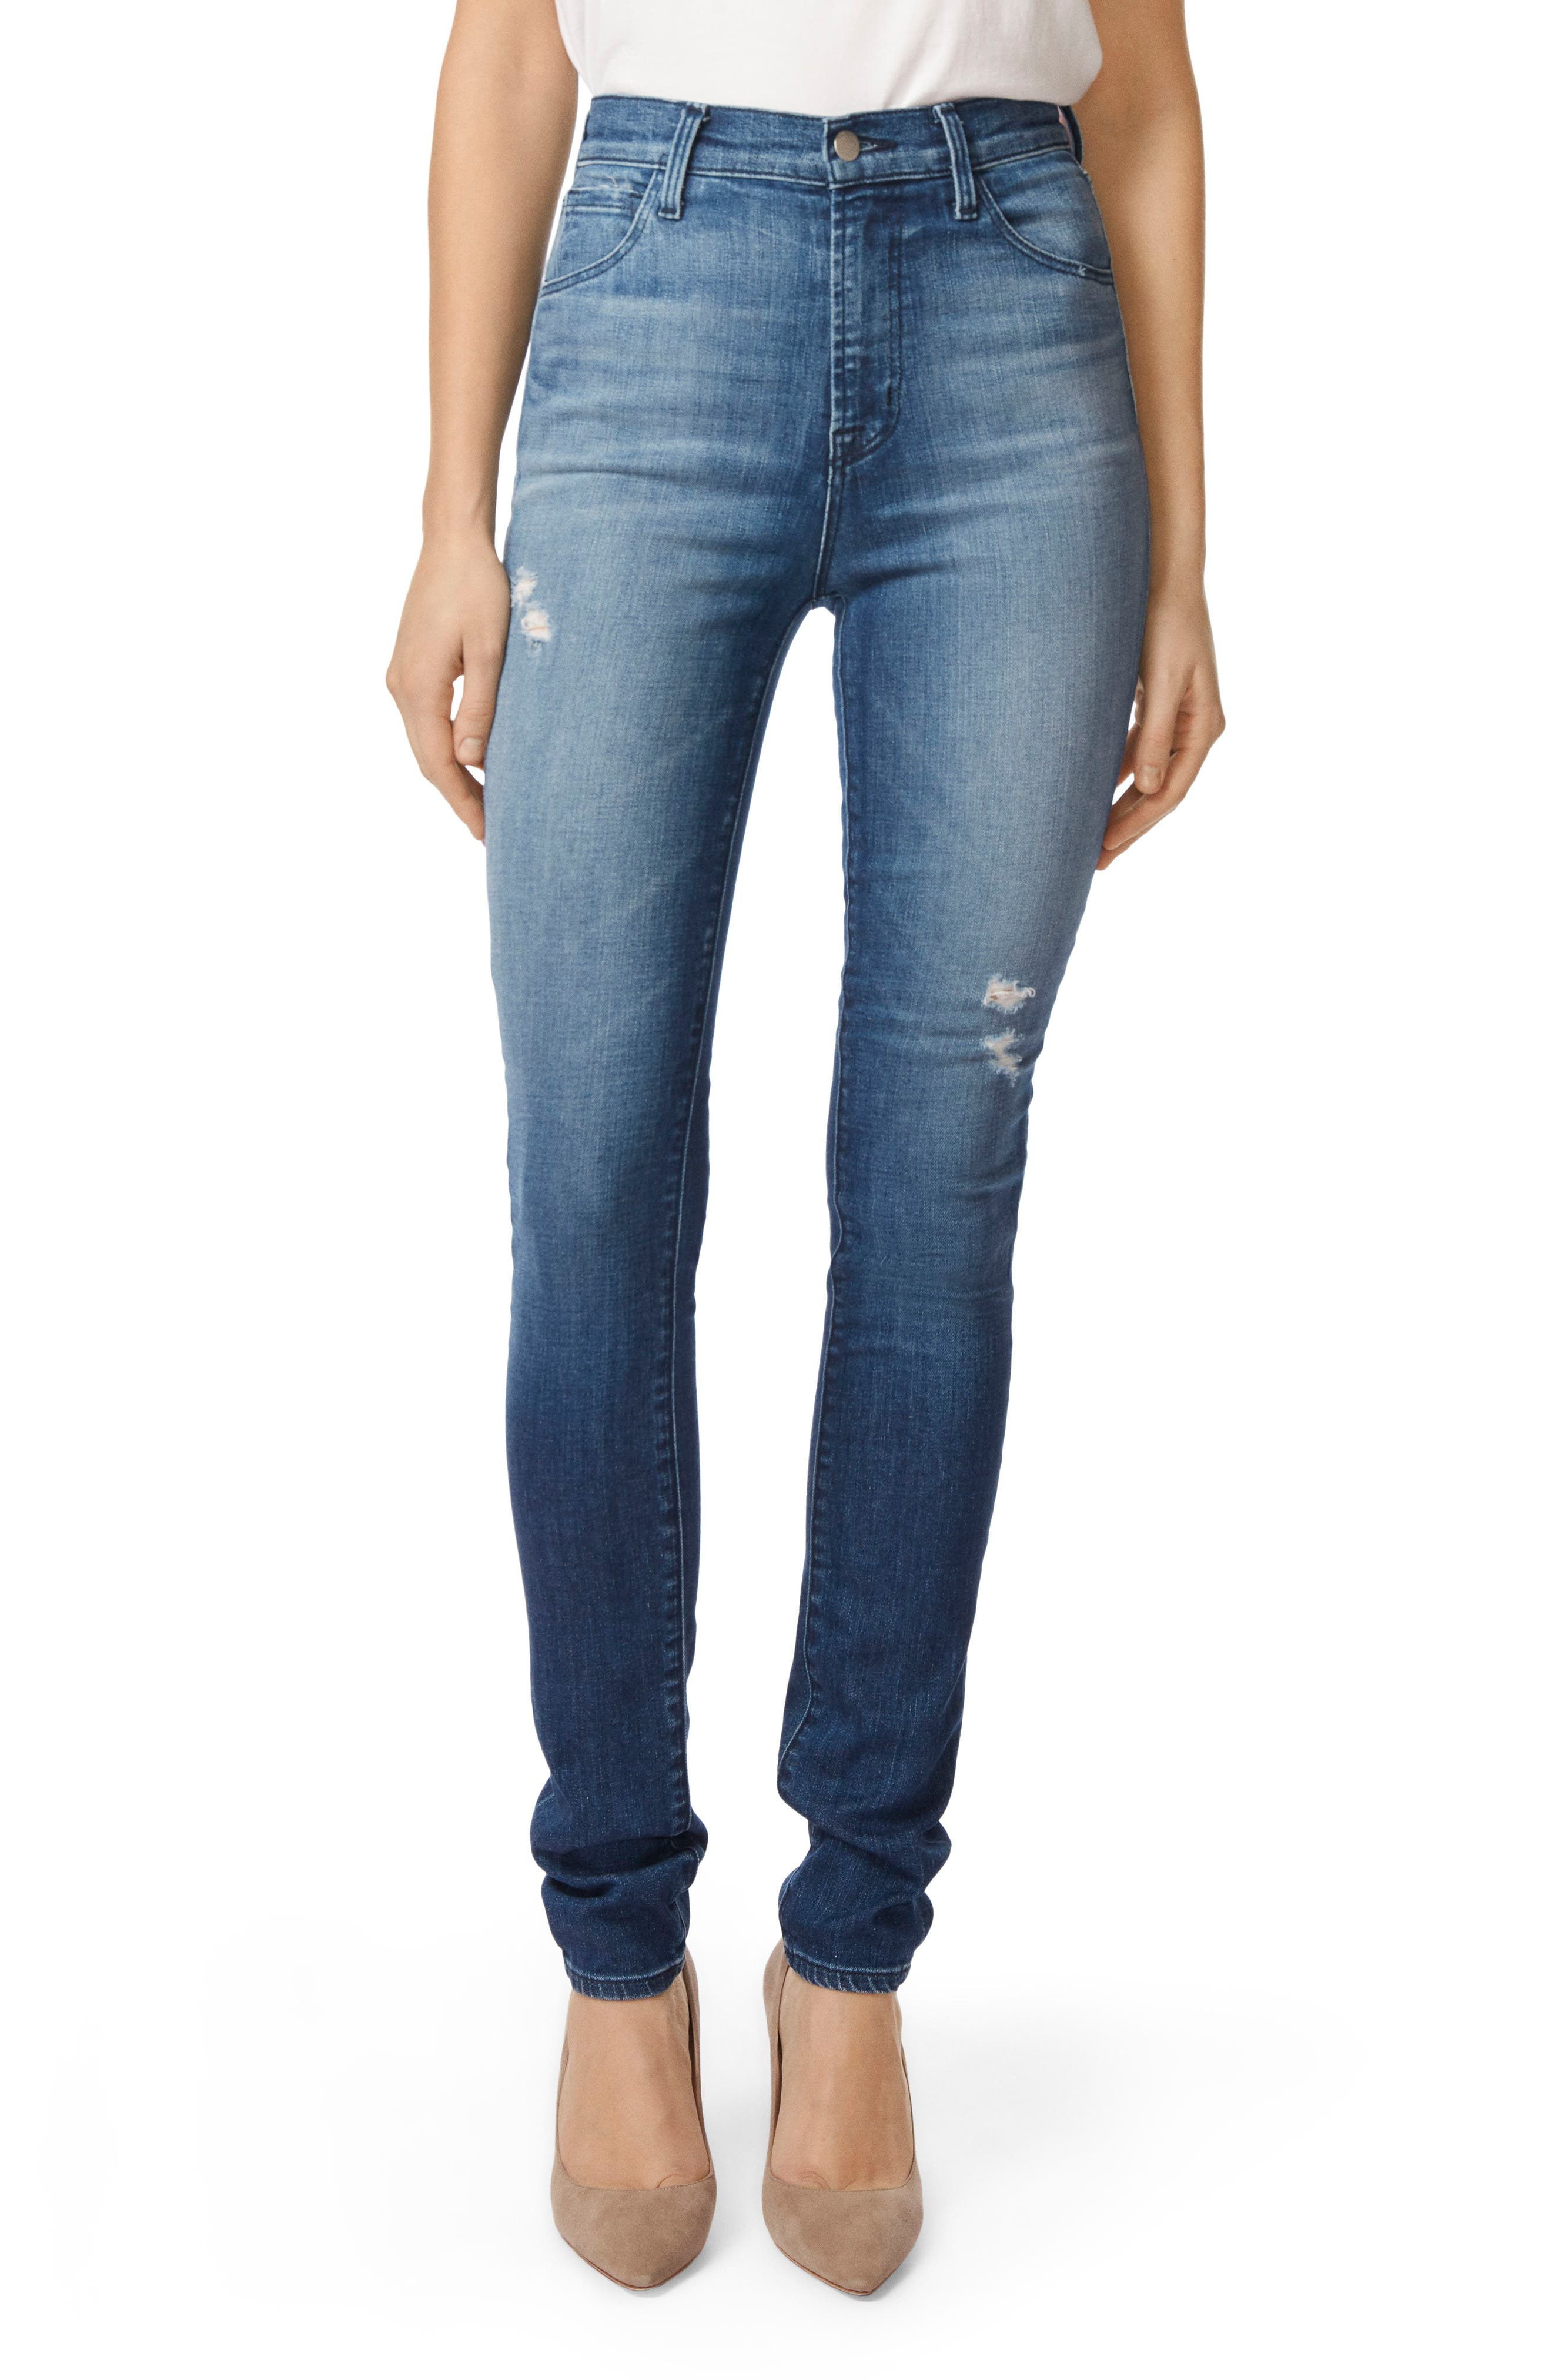 Carolina Super High Waist Skinny Jeans,                         Main,                         color, Mystic